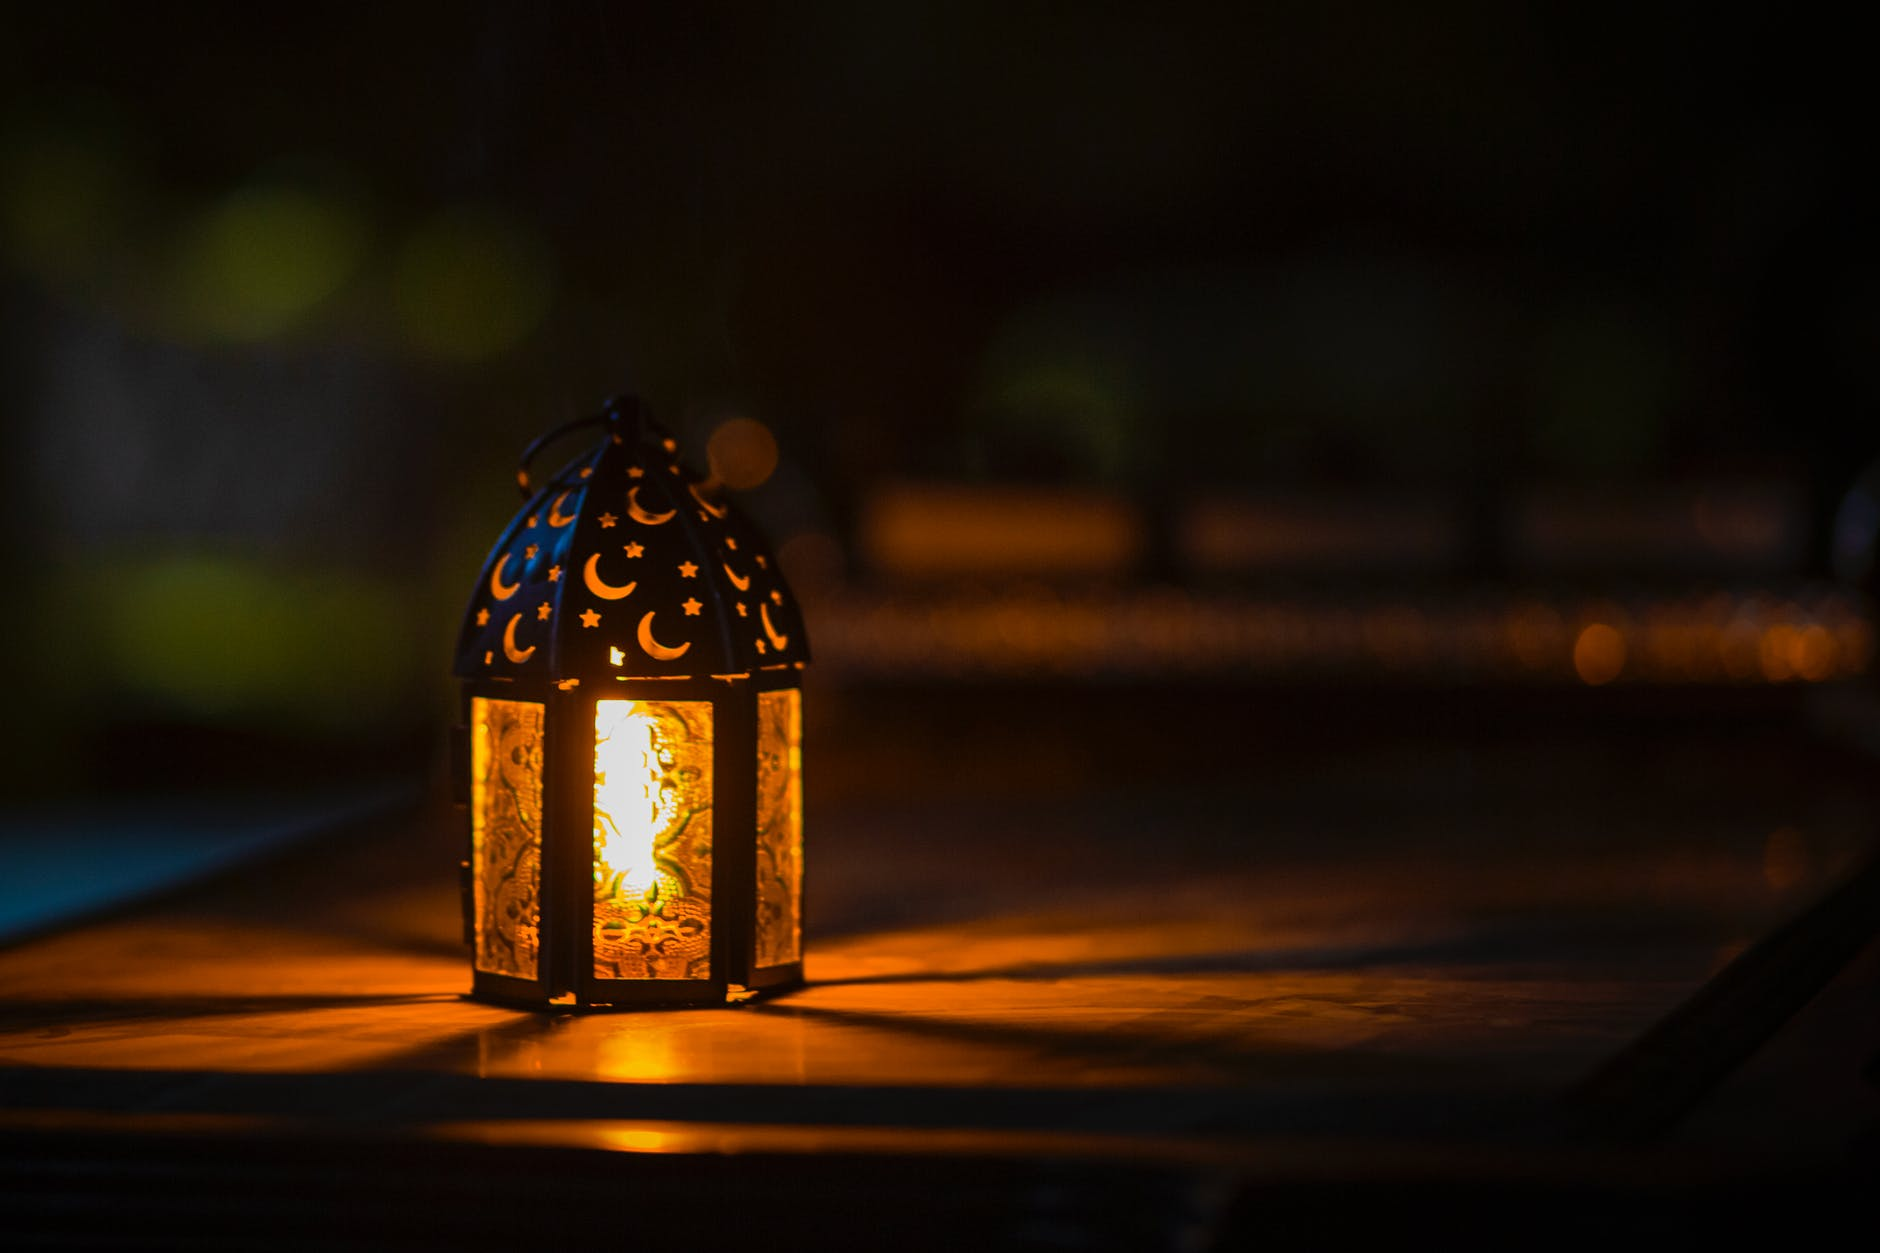 Membuat Lampu Hias dari Paralon